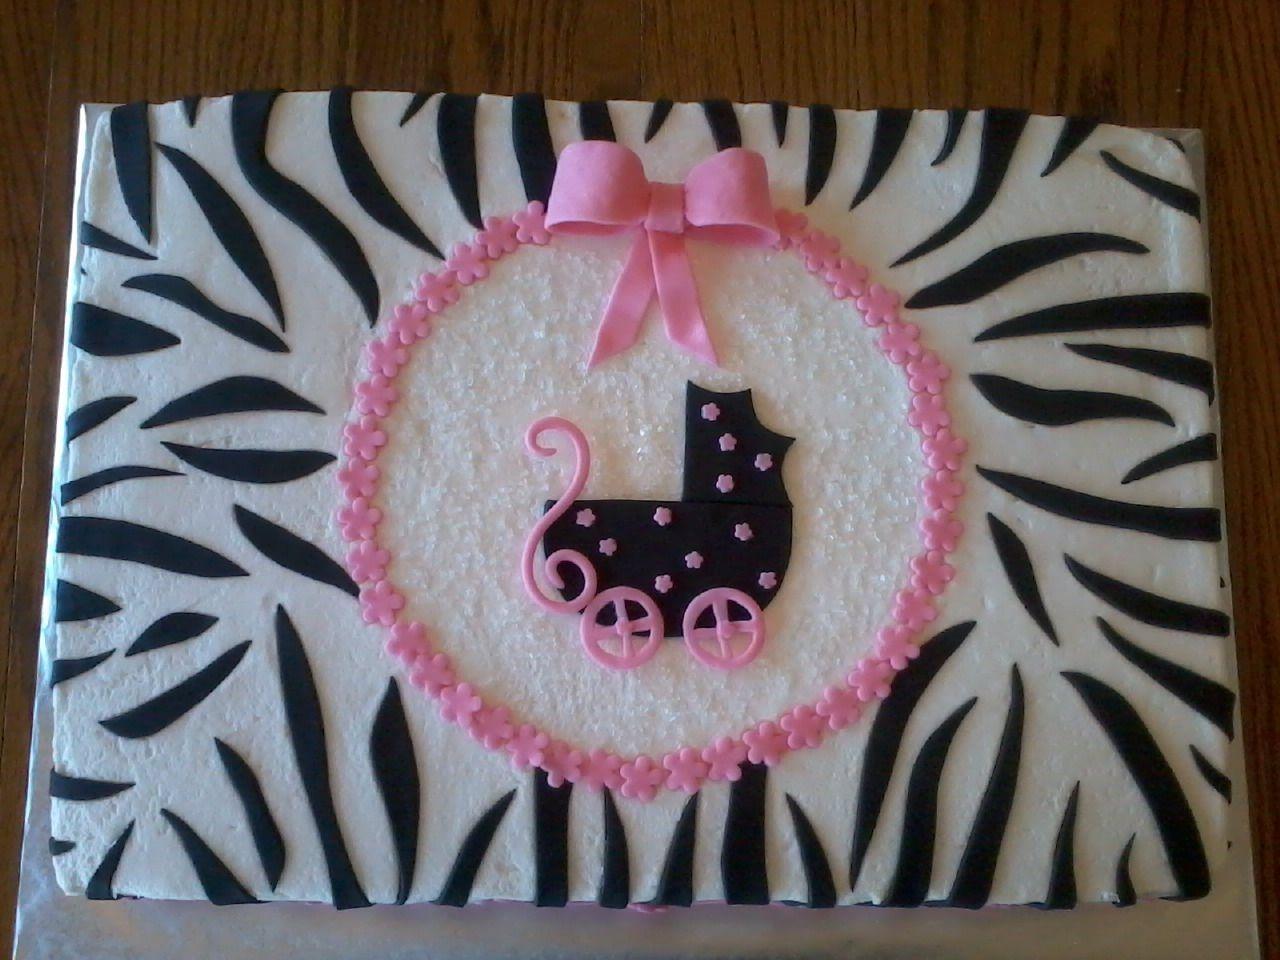 Baby Shower Cakes With Zebra Stripes ~ Zebra baby shower half sheet cake with a fondant stroller zebra